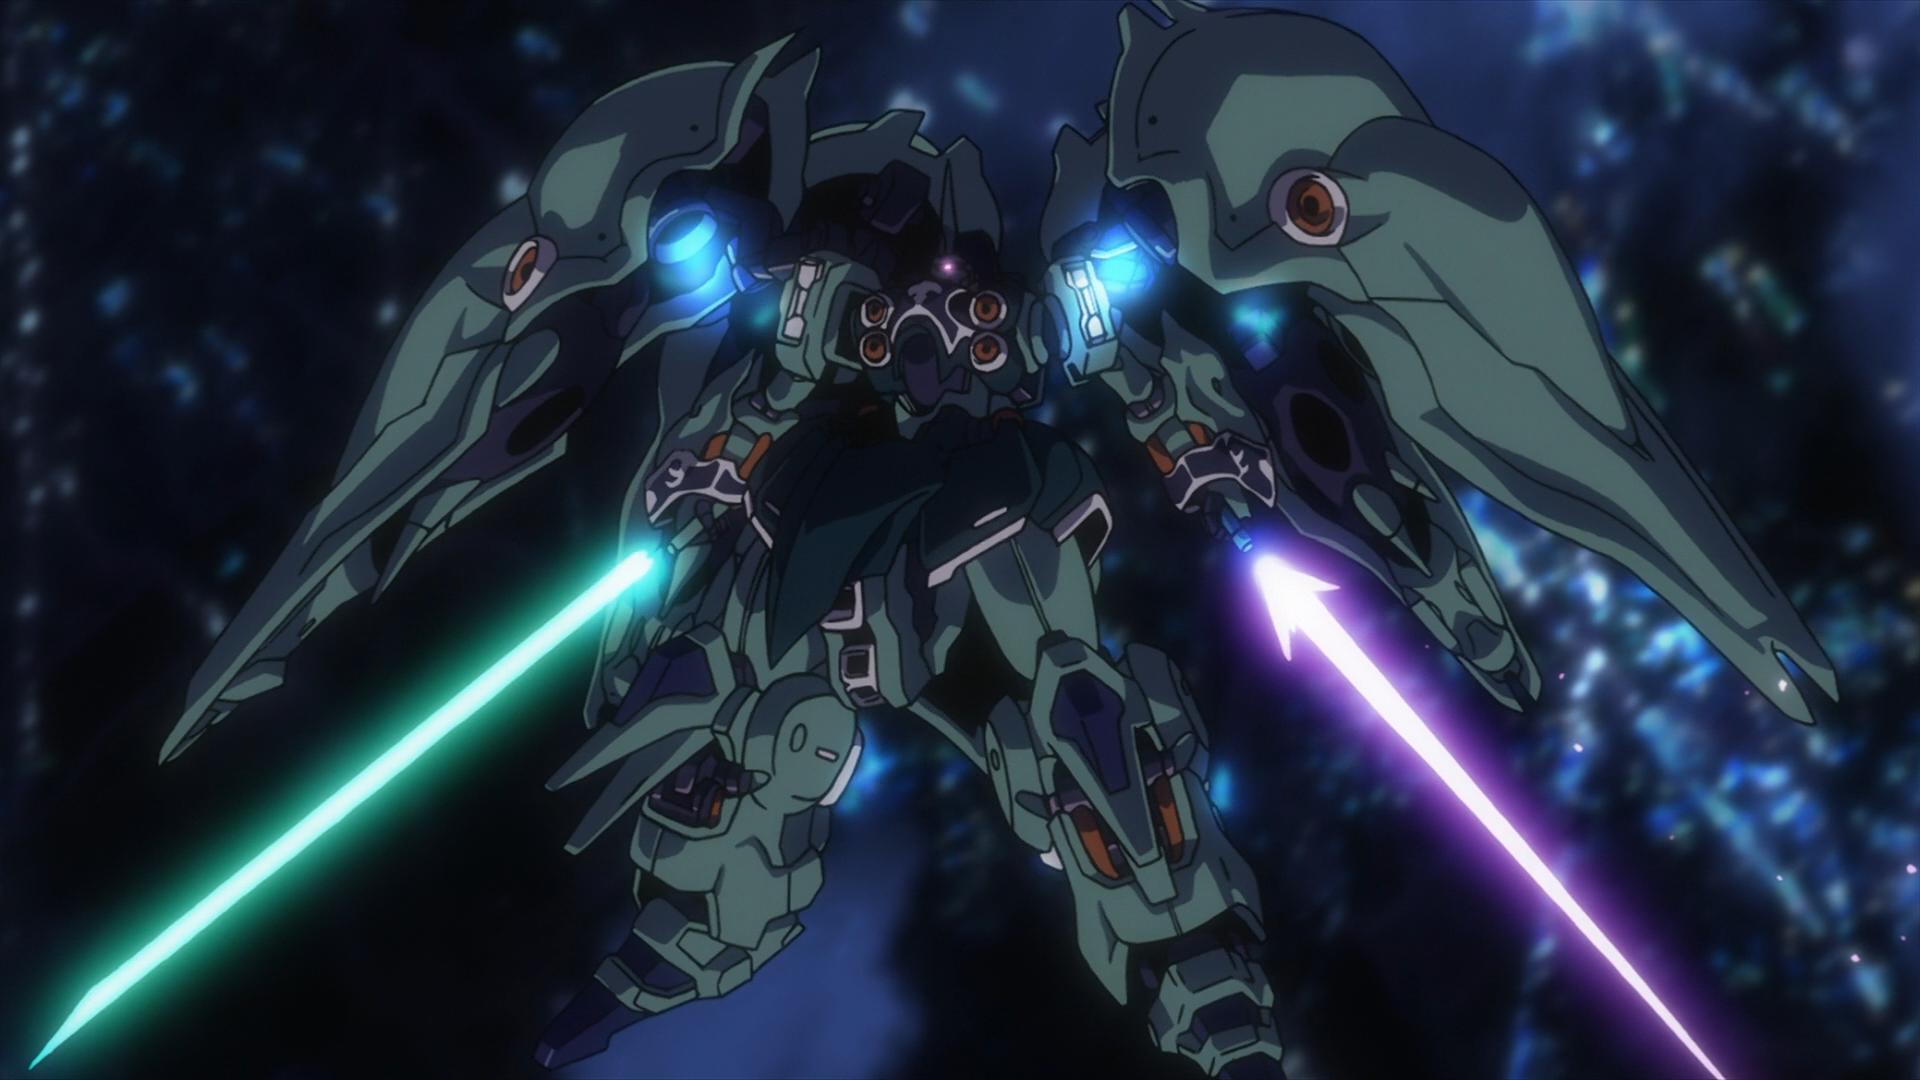 Gundam HD Wallpapers 1920x1080